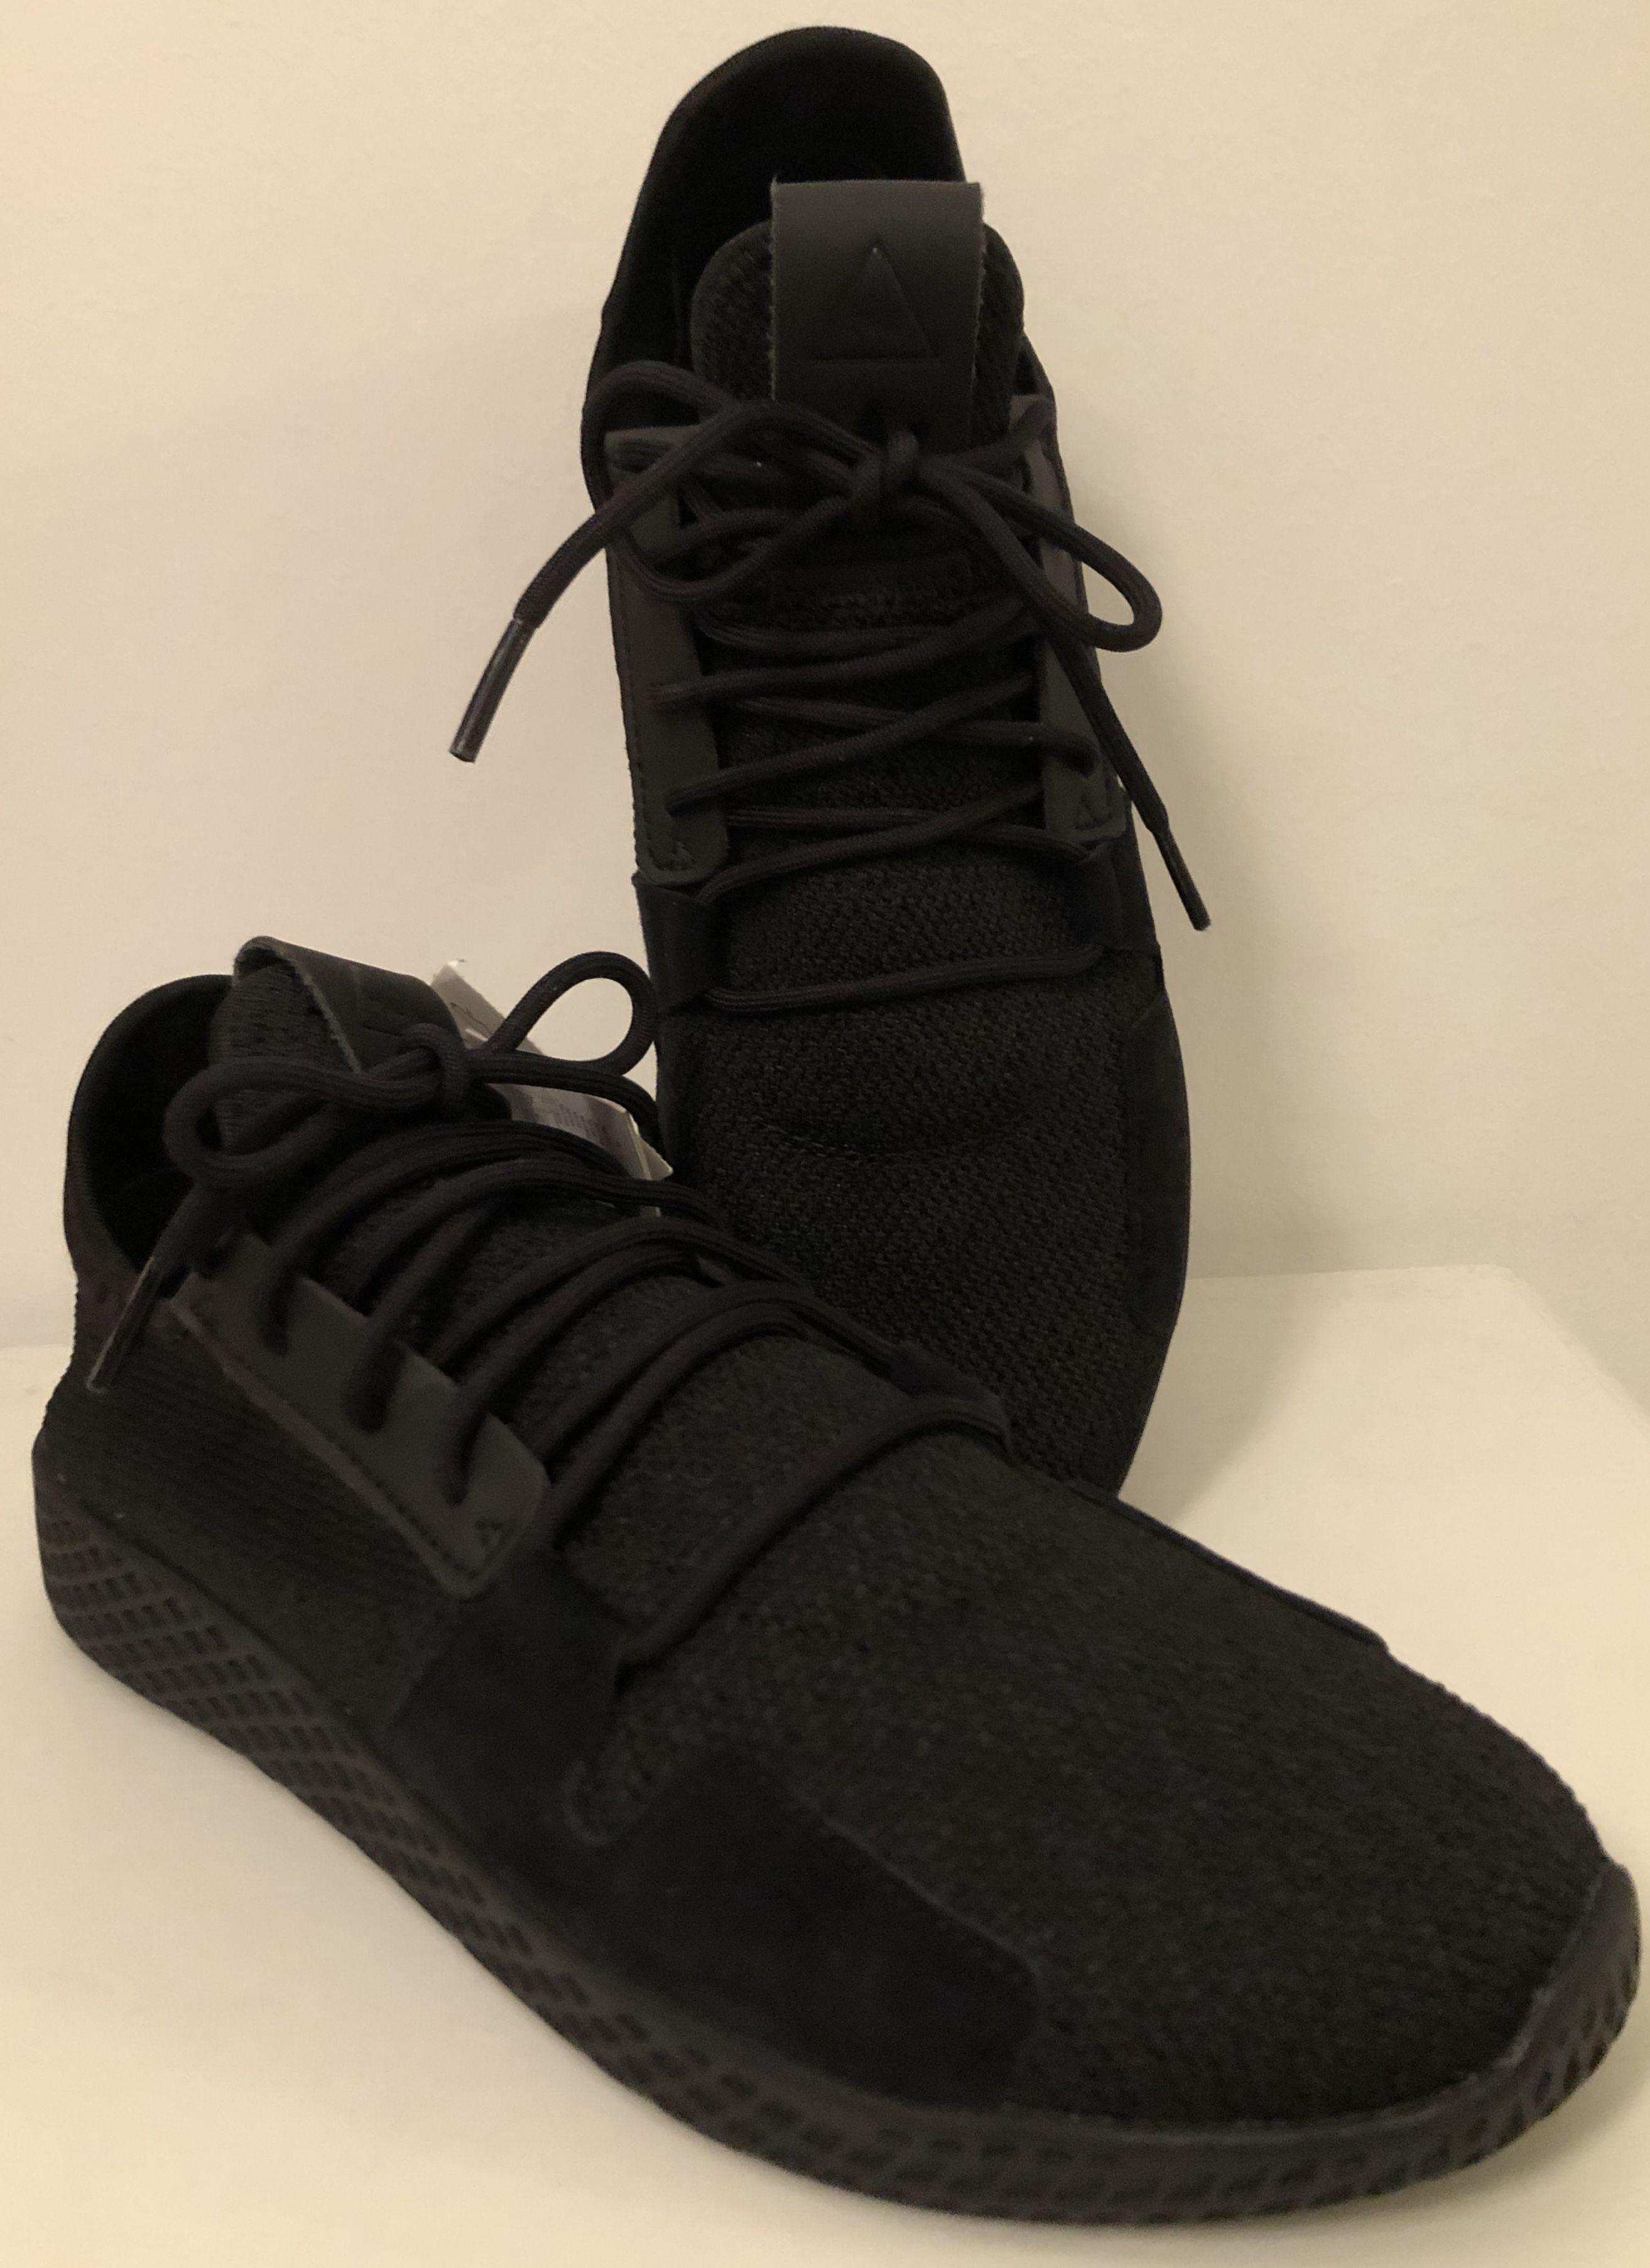 Adidas Pharrell Williams Tennis Hu V2 Black 2018 Schuhe